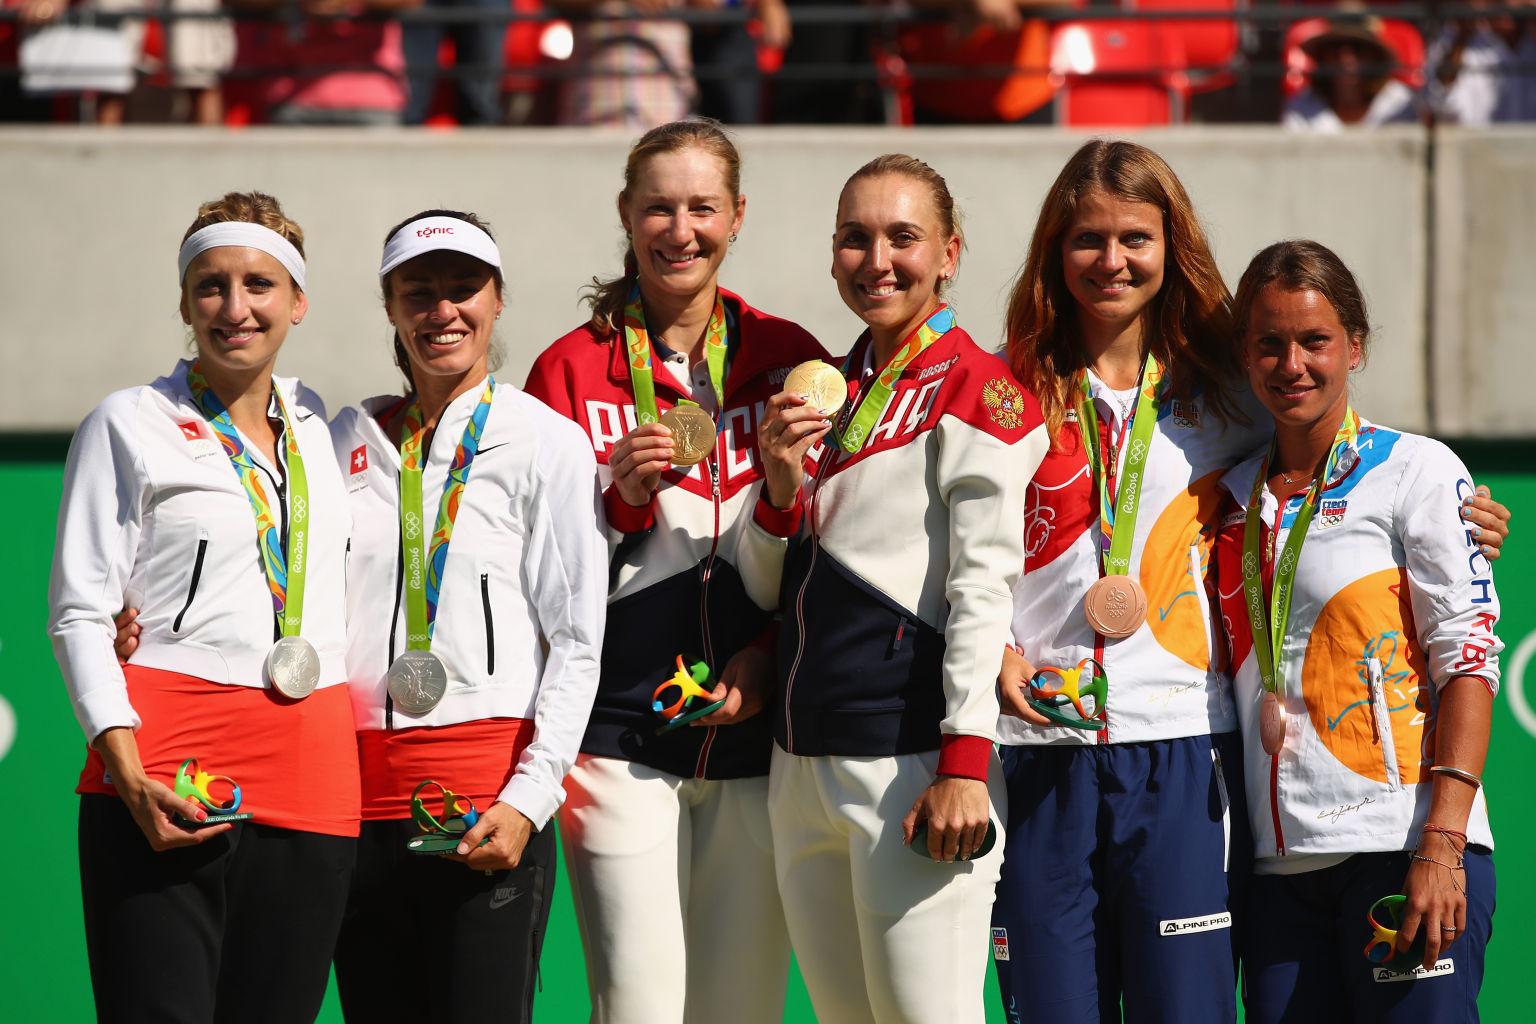 Die Medaillengewinner im Damen-Doppel in Rio: Bacsinszky/Hingis/ (Silber), Makarova/Vesnina, Safarova/Strycova (Bronze)  (v.l.).